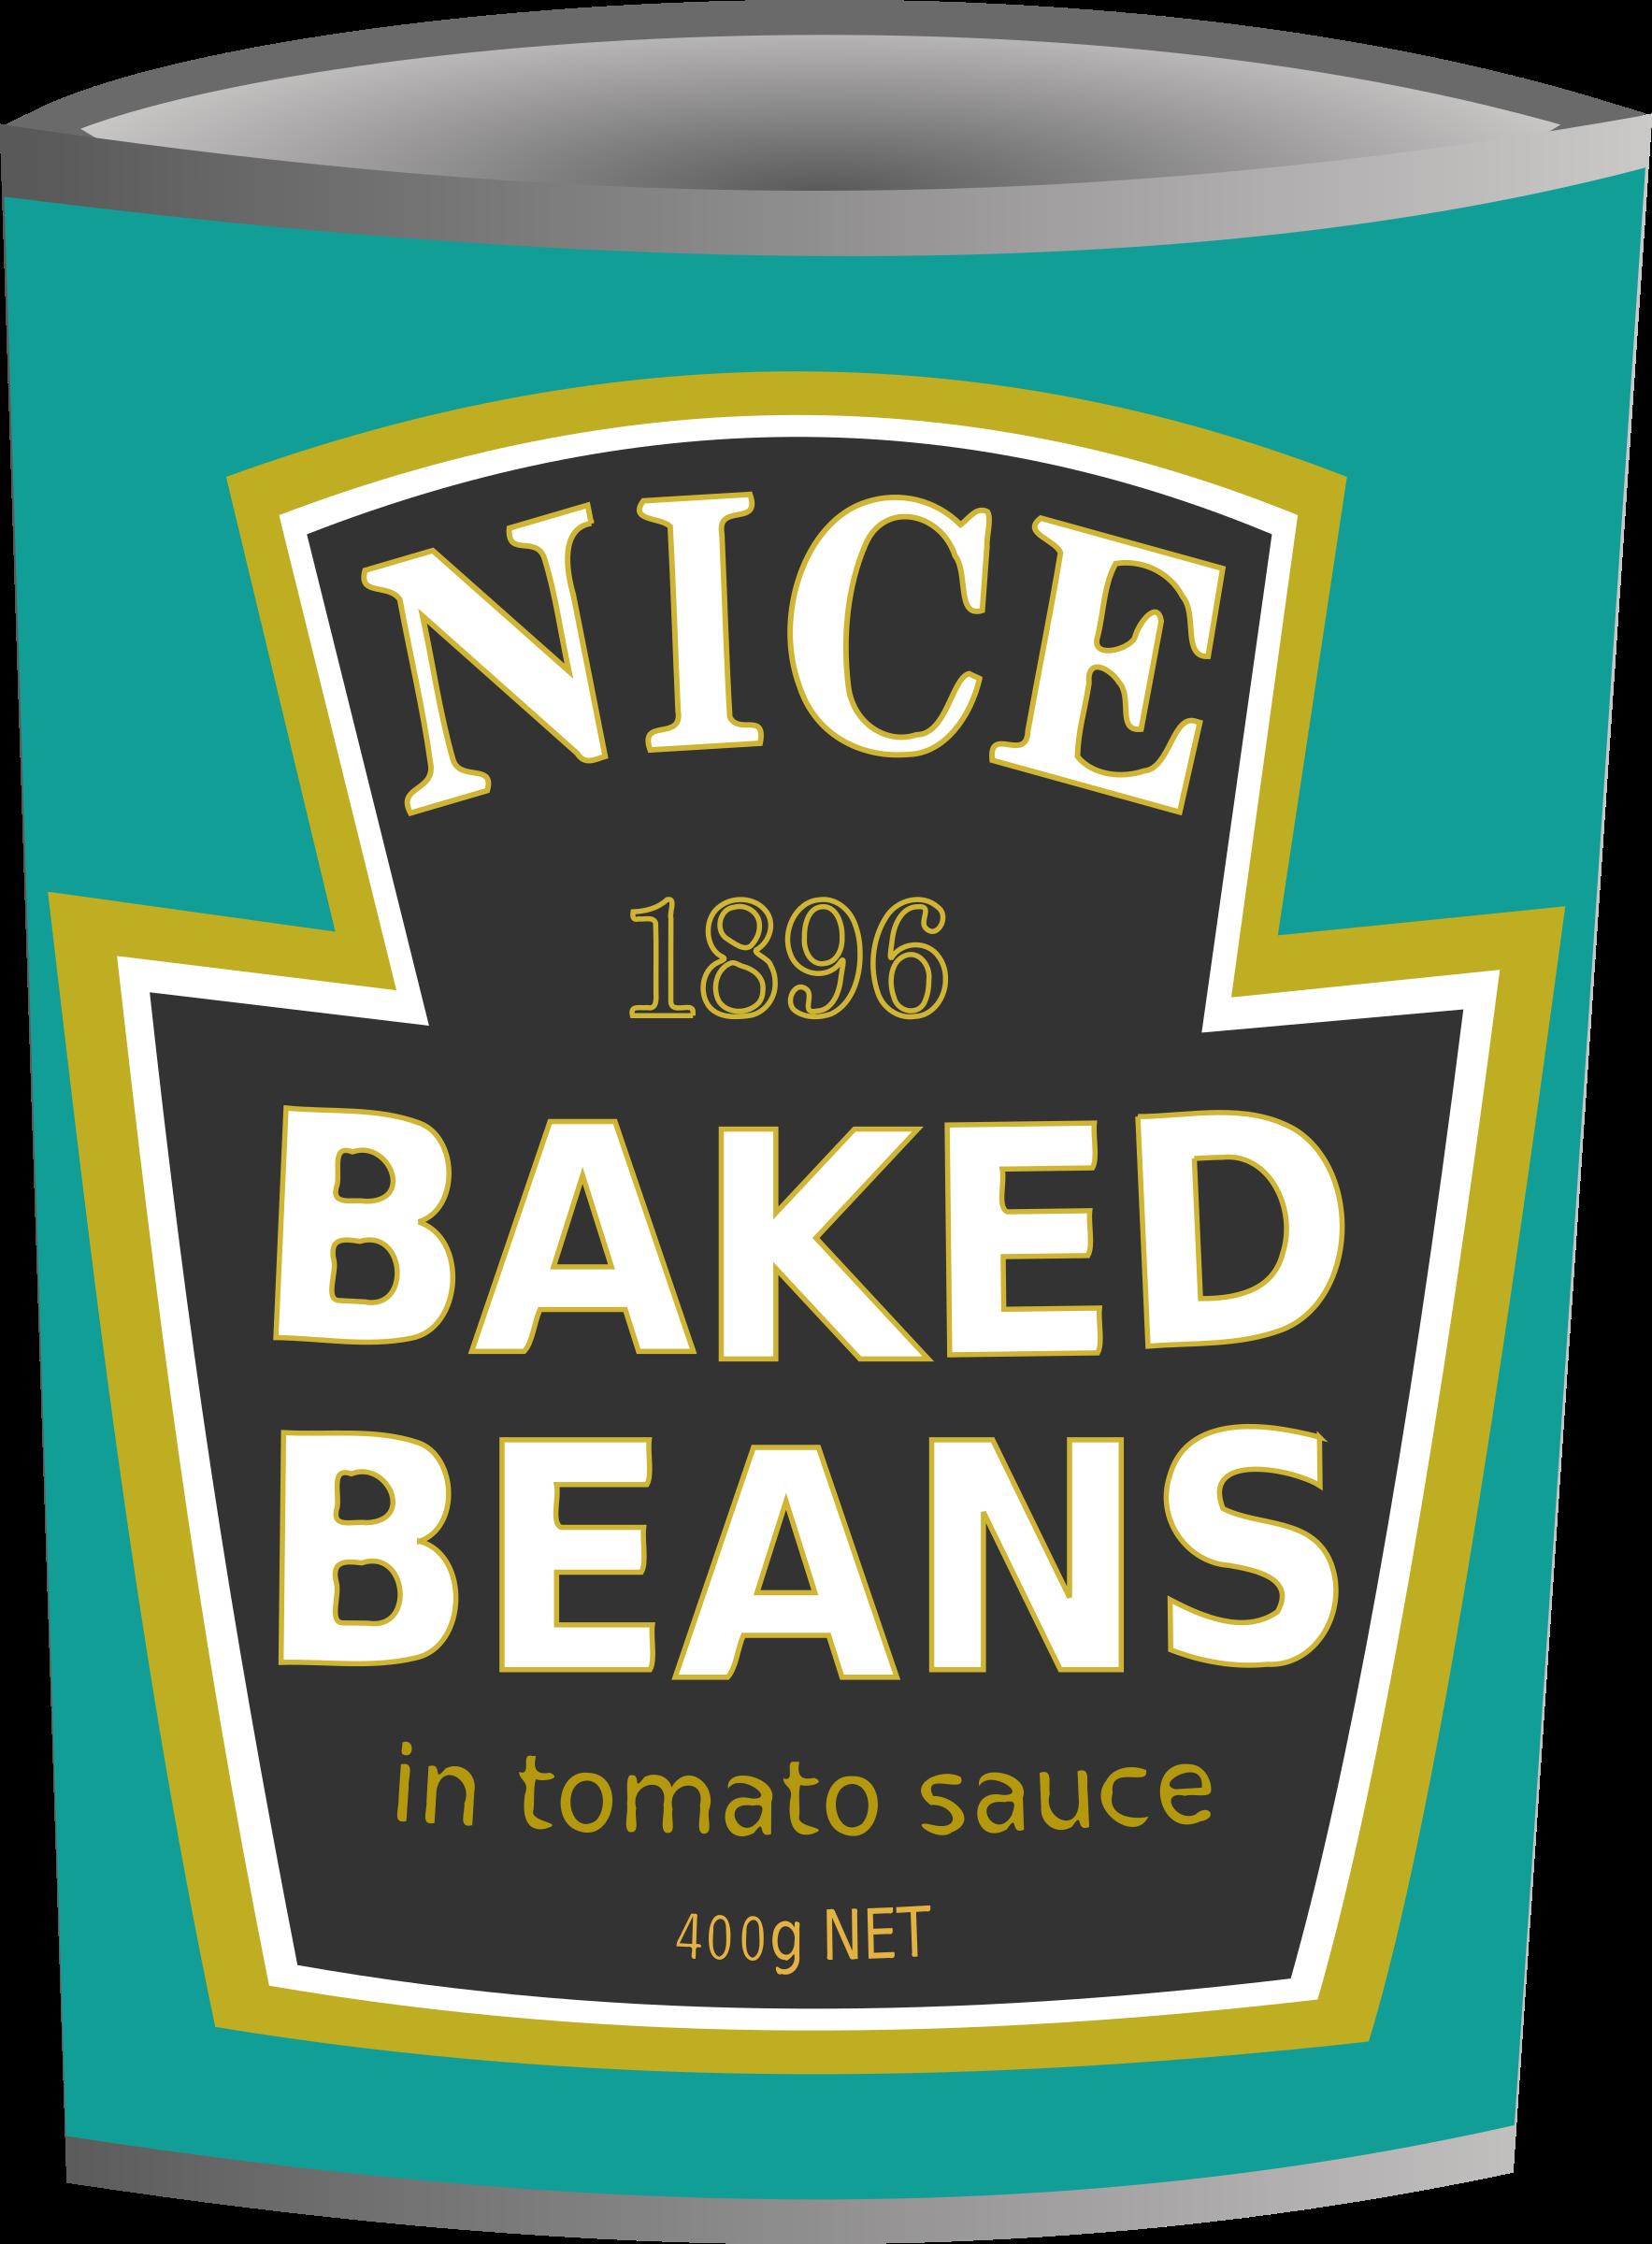 Bean clipart baked bean. Nice beans